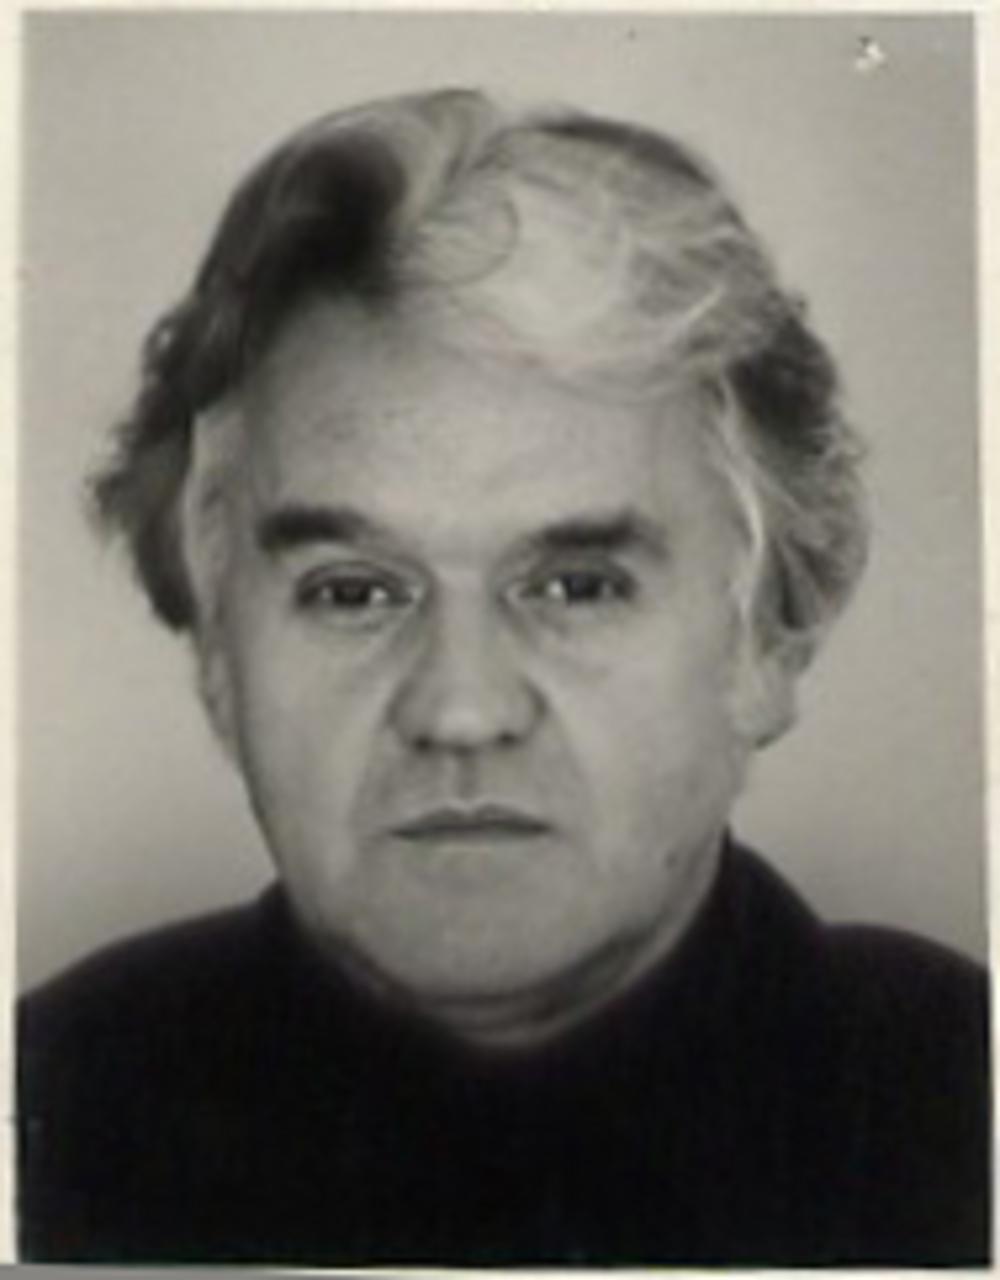 image for Bisiaux, Marcel (1922-1990)